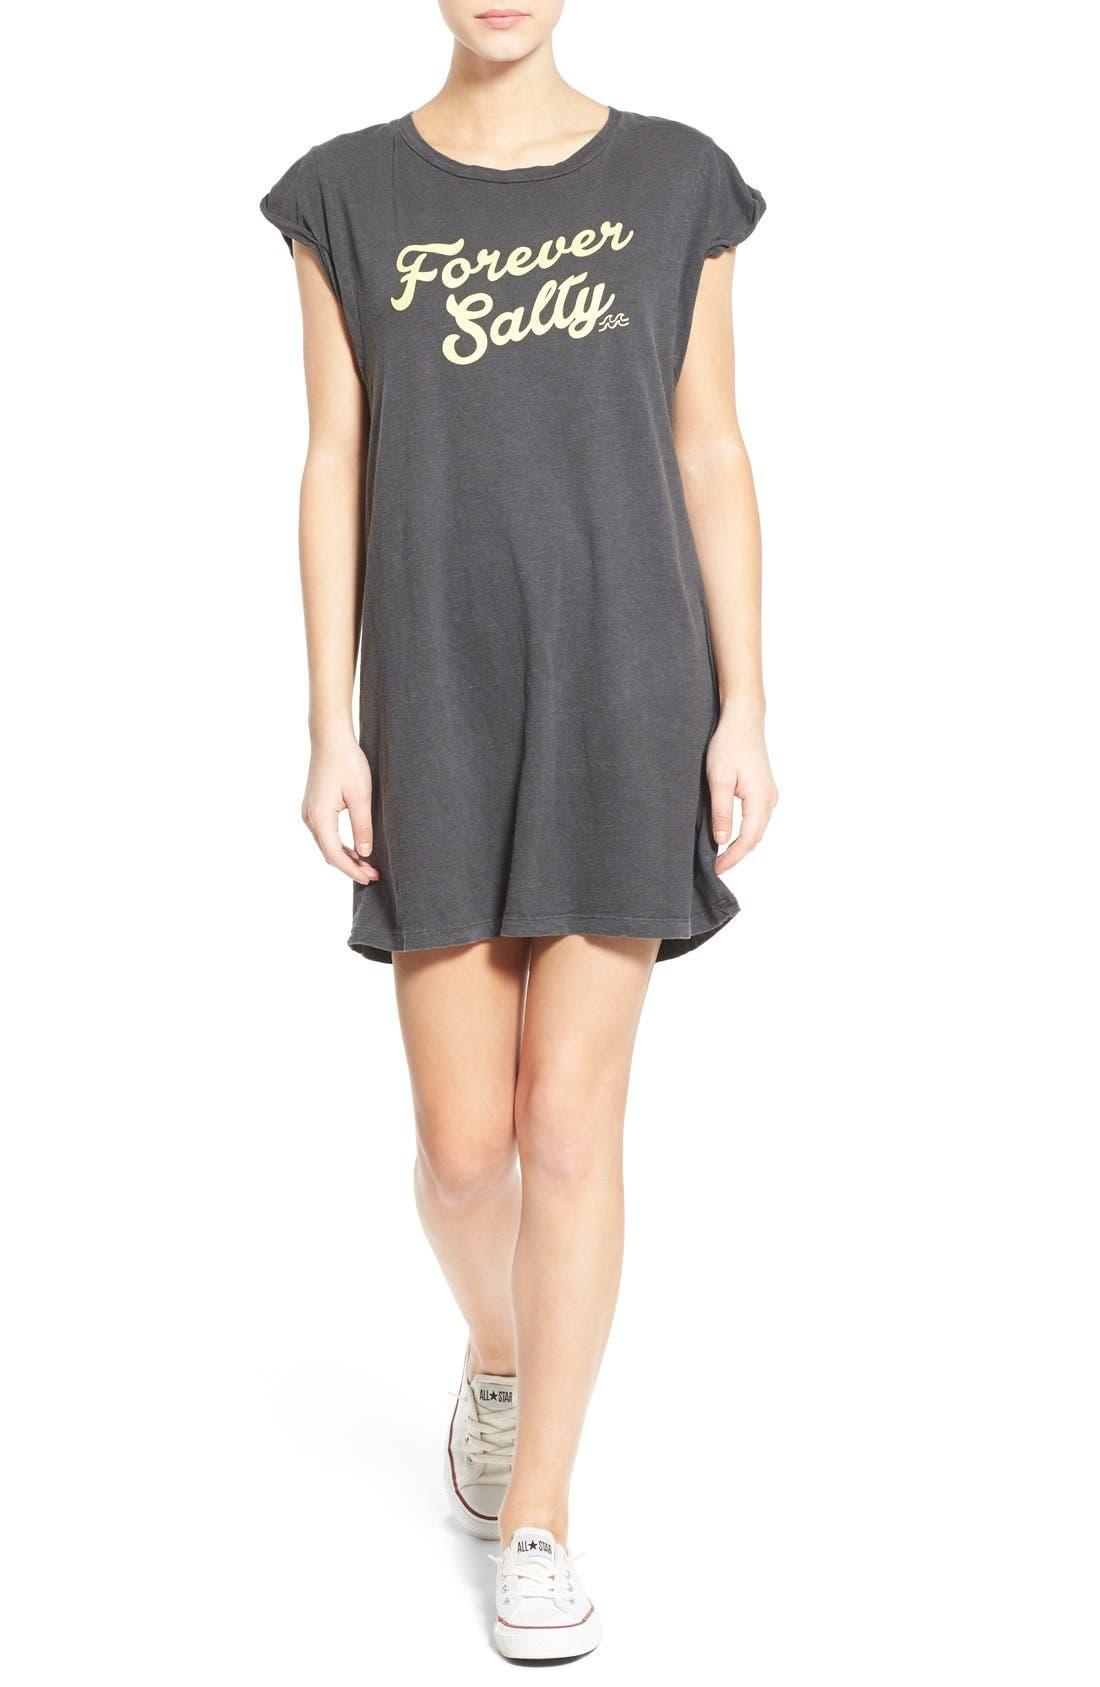 Alternate Image 1 Selected - Billabong 'Forever Salty' Graphic T-Shirt Dress